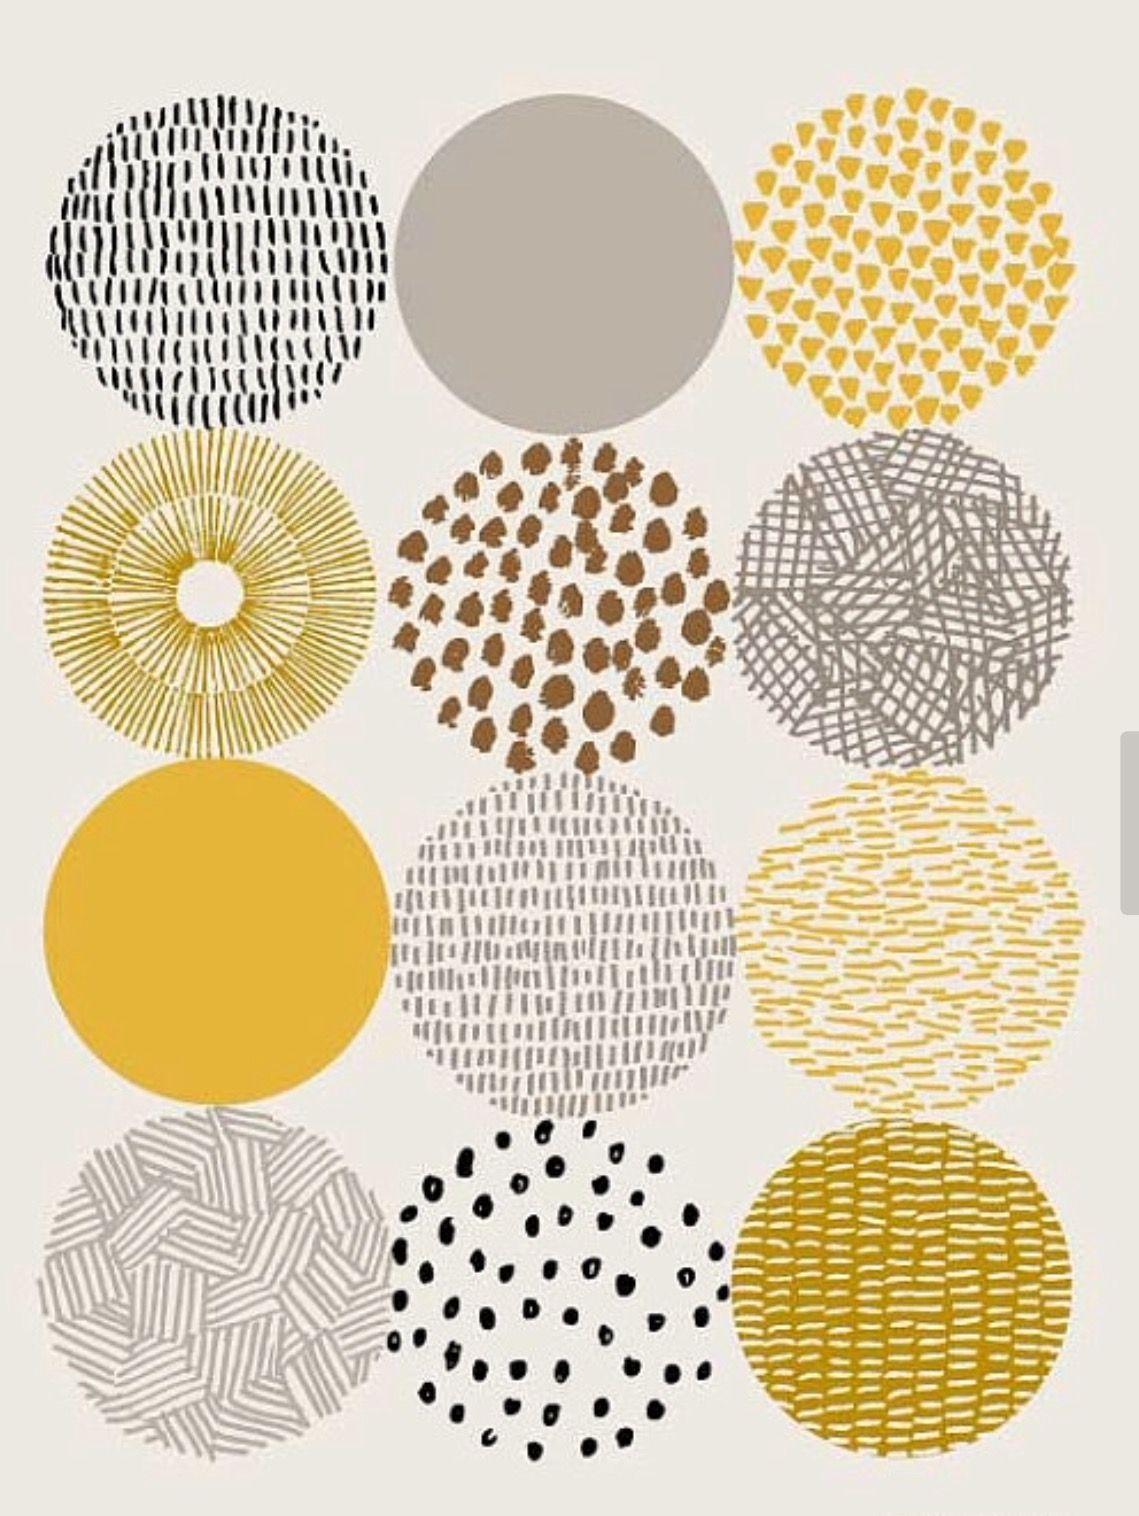 Pin By Lais Barros On Lista De Nomes Pattern Art Prints